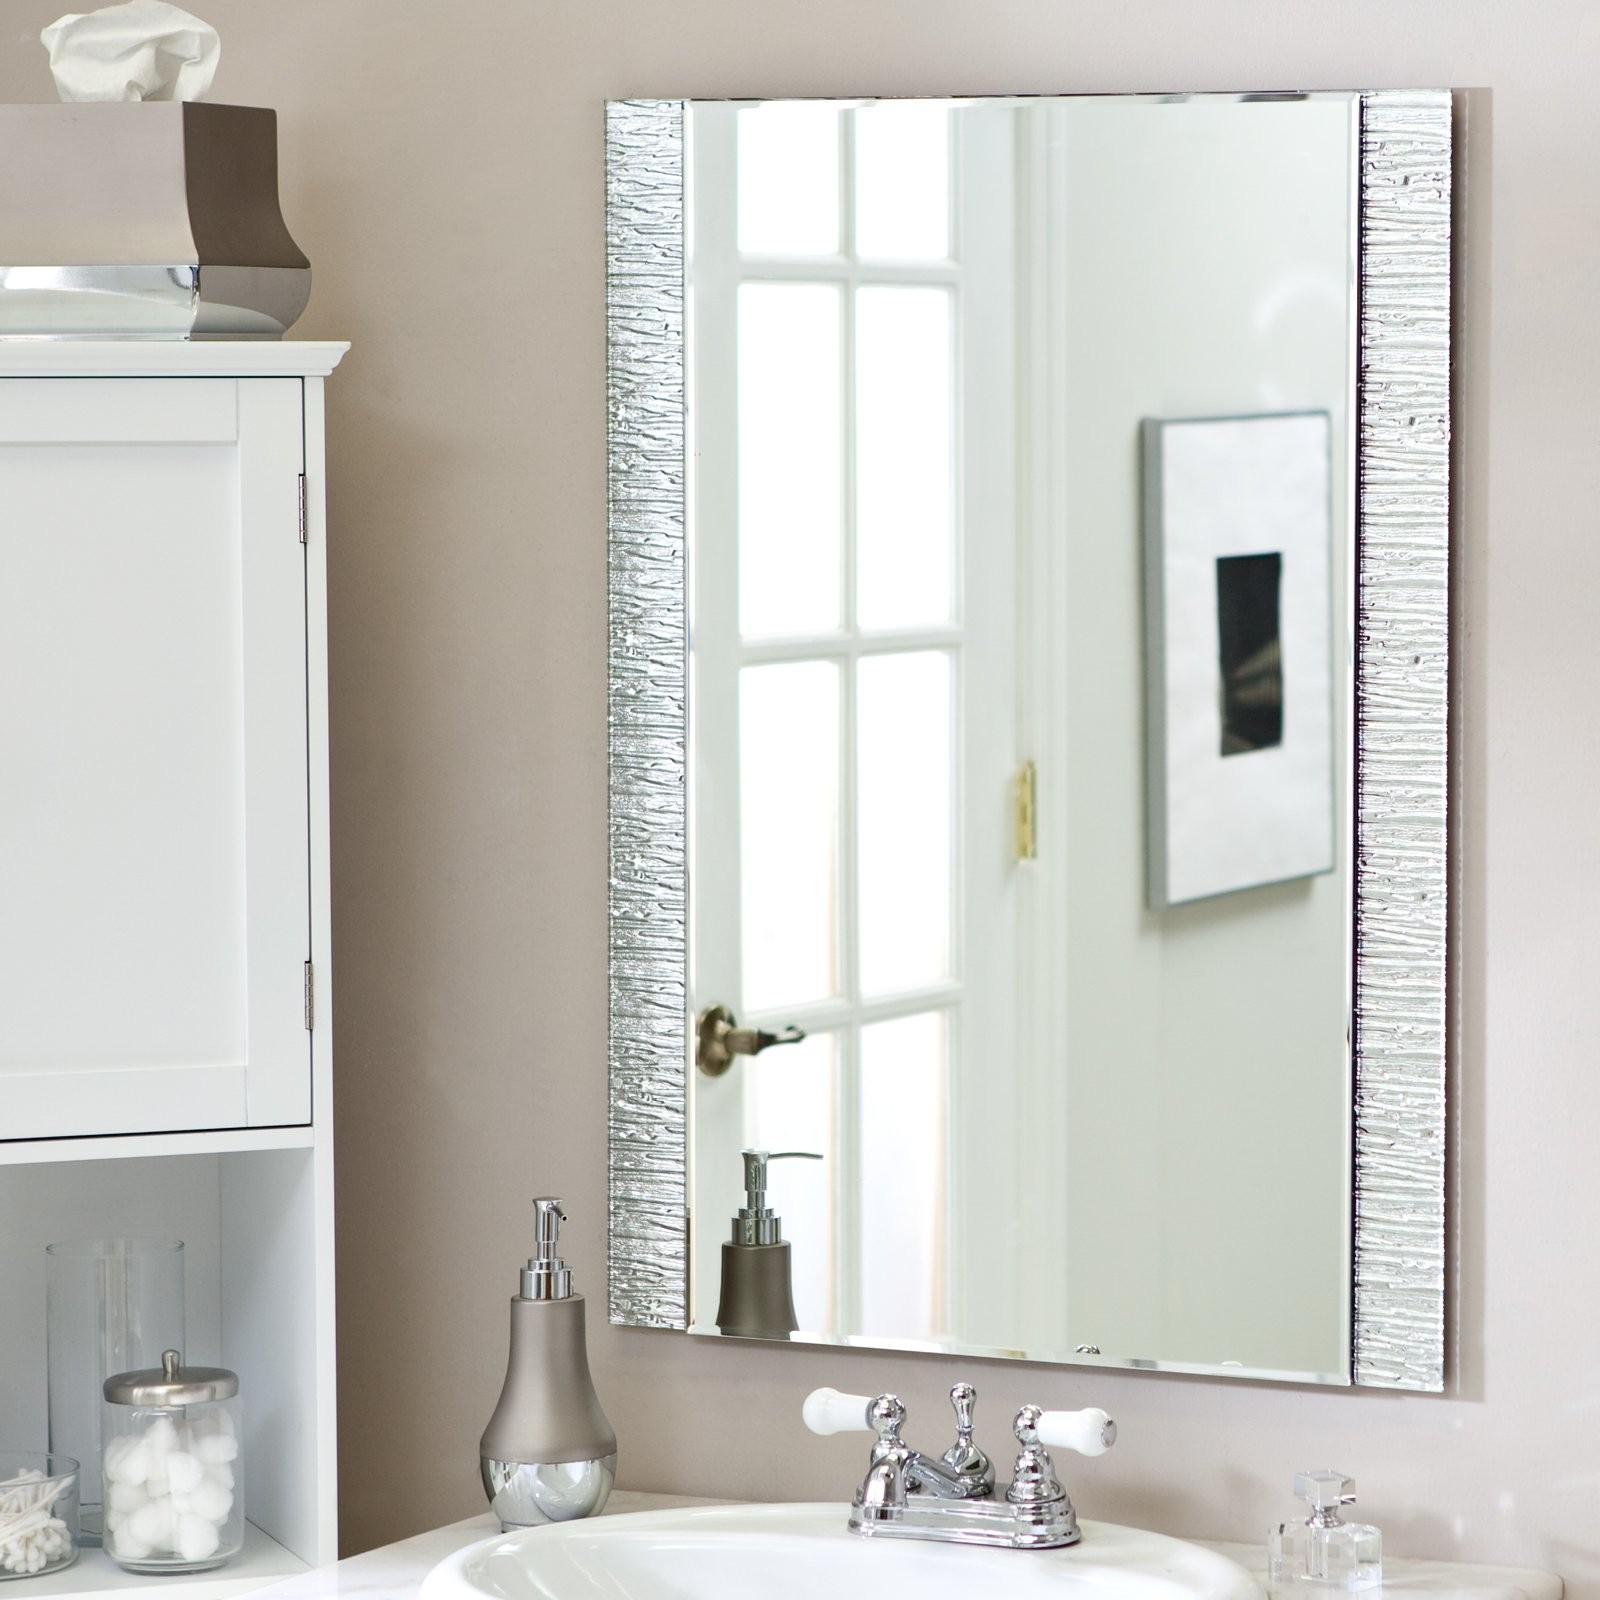 Bathroom Frameless Mirror Incredible Beveled Bathroom Mirrors Frameless Bathroom Mirrors Layout